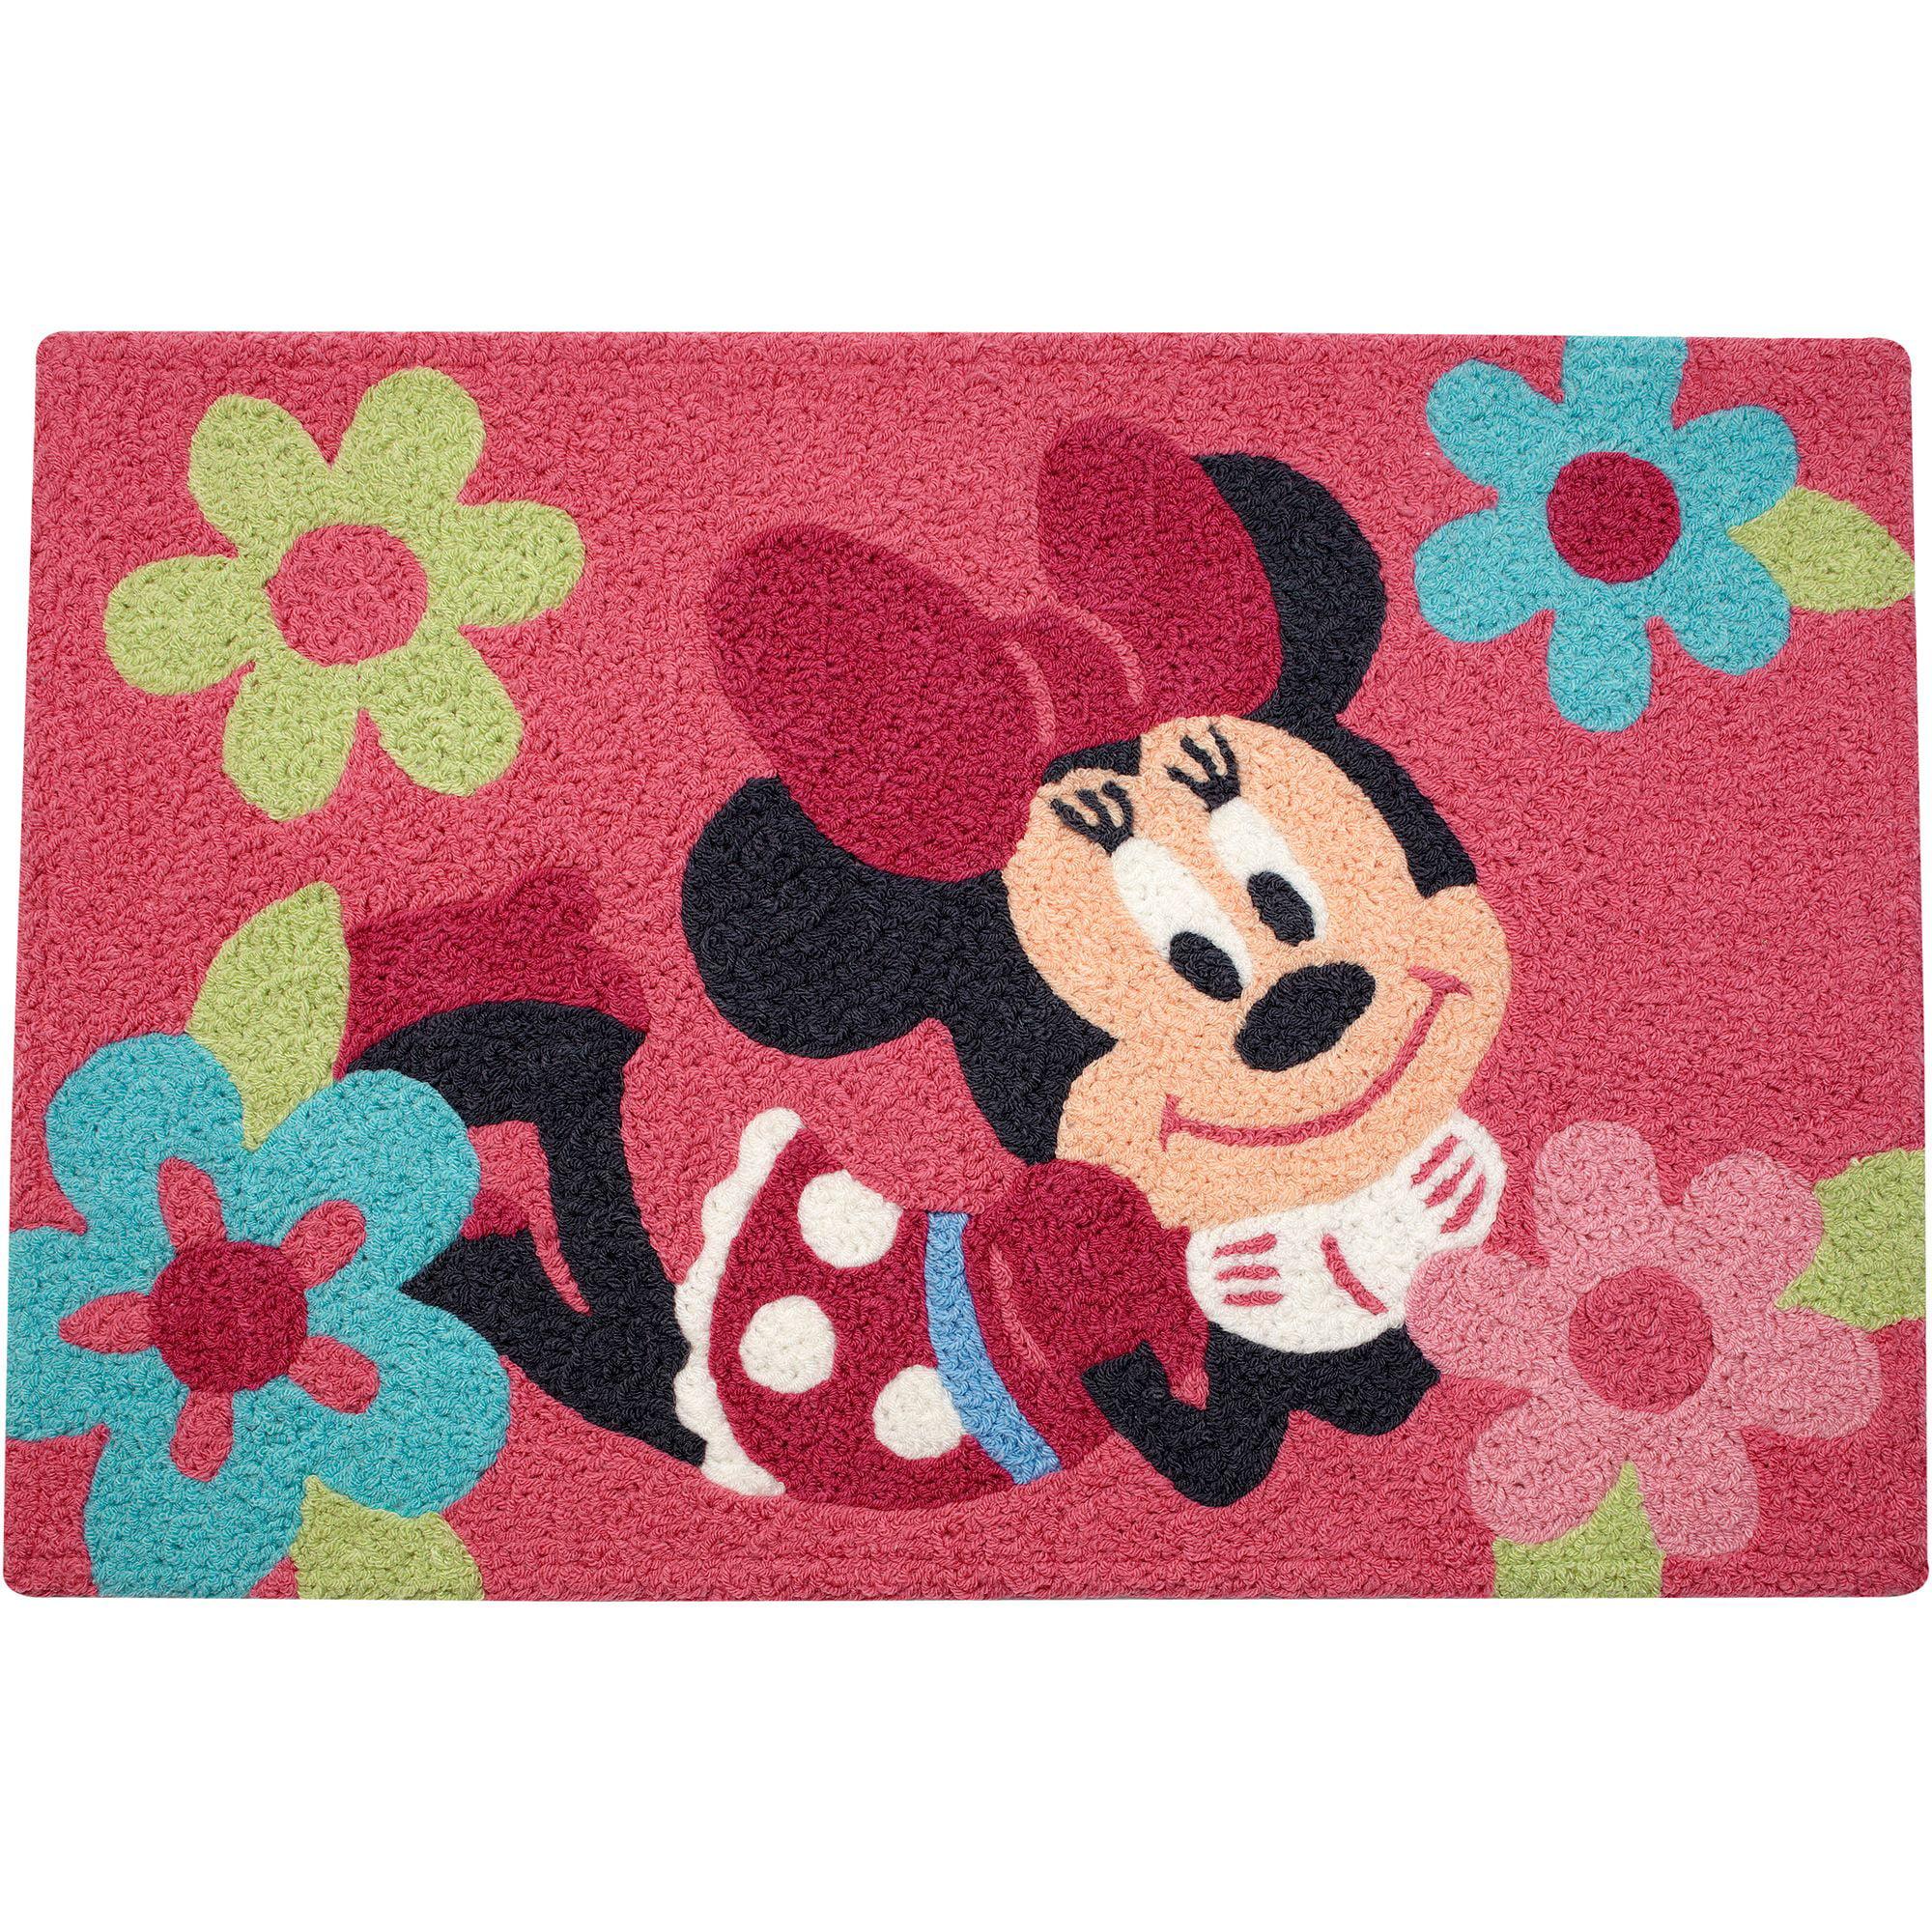 Disney Minnie Mouse Rug